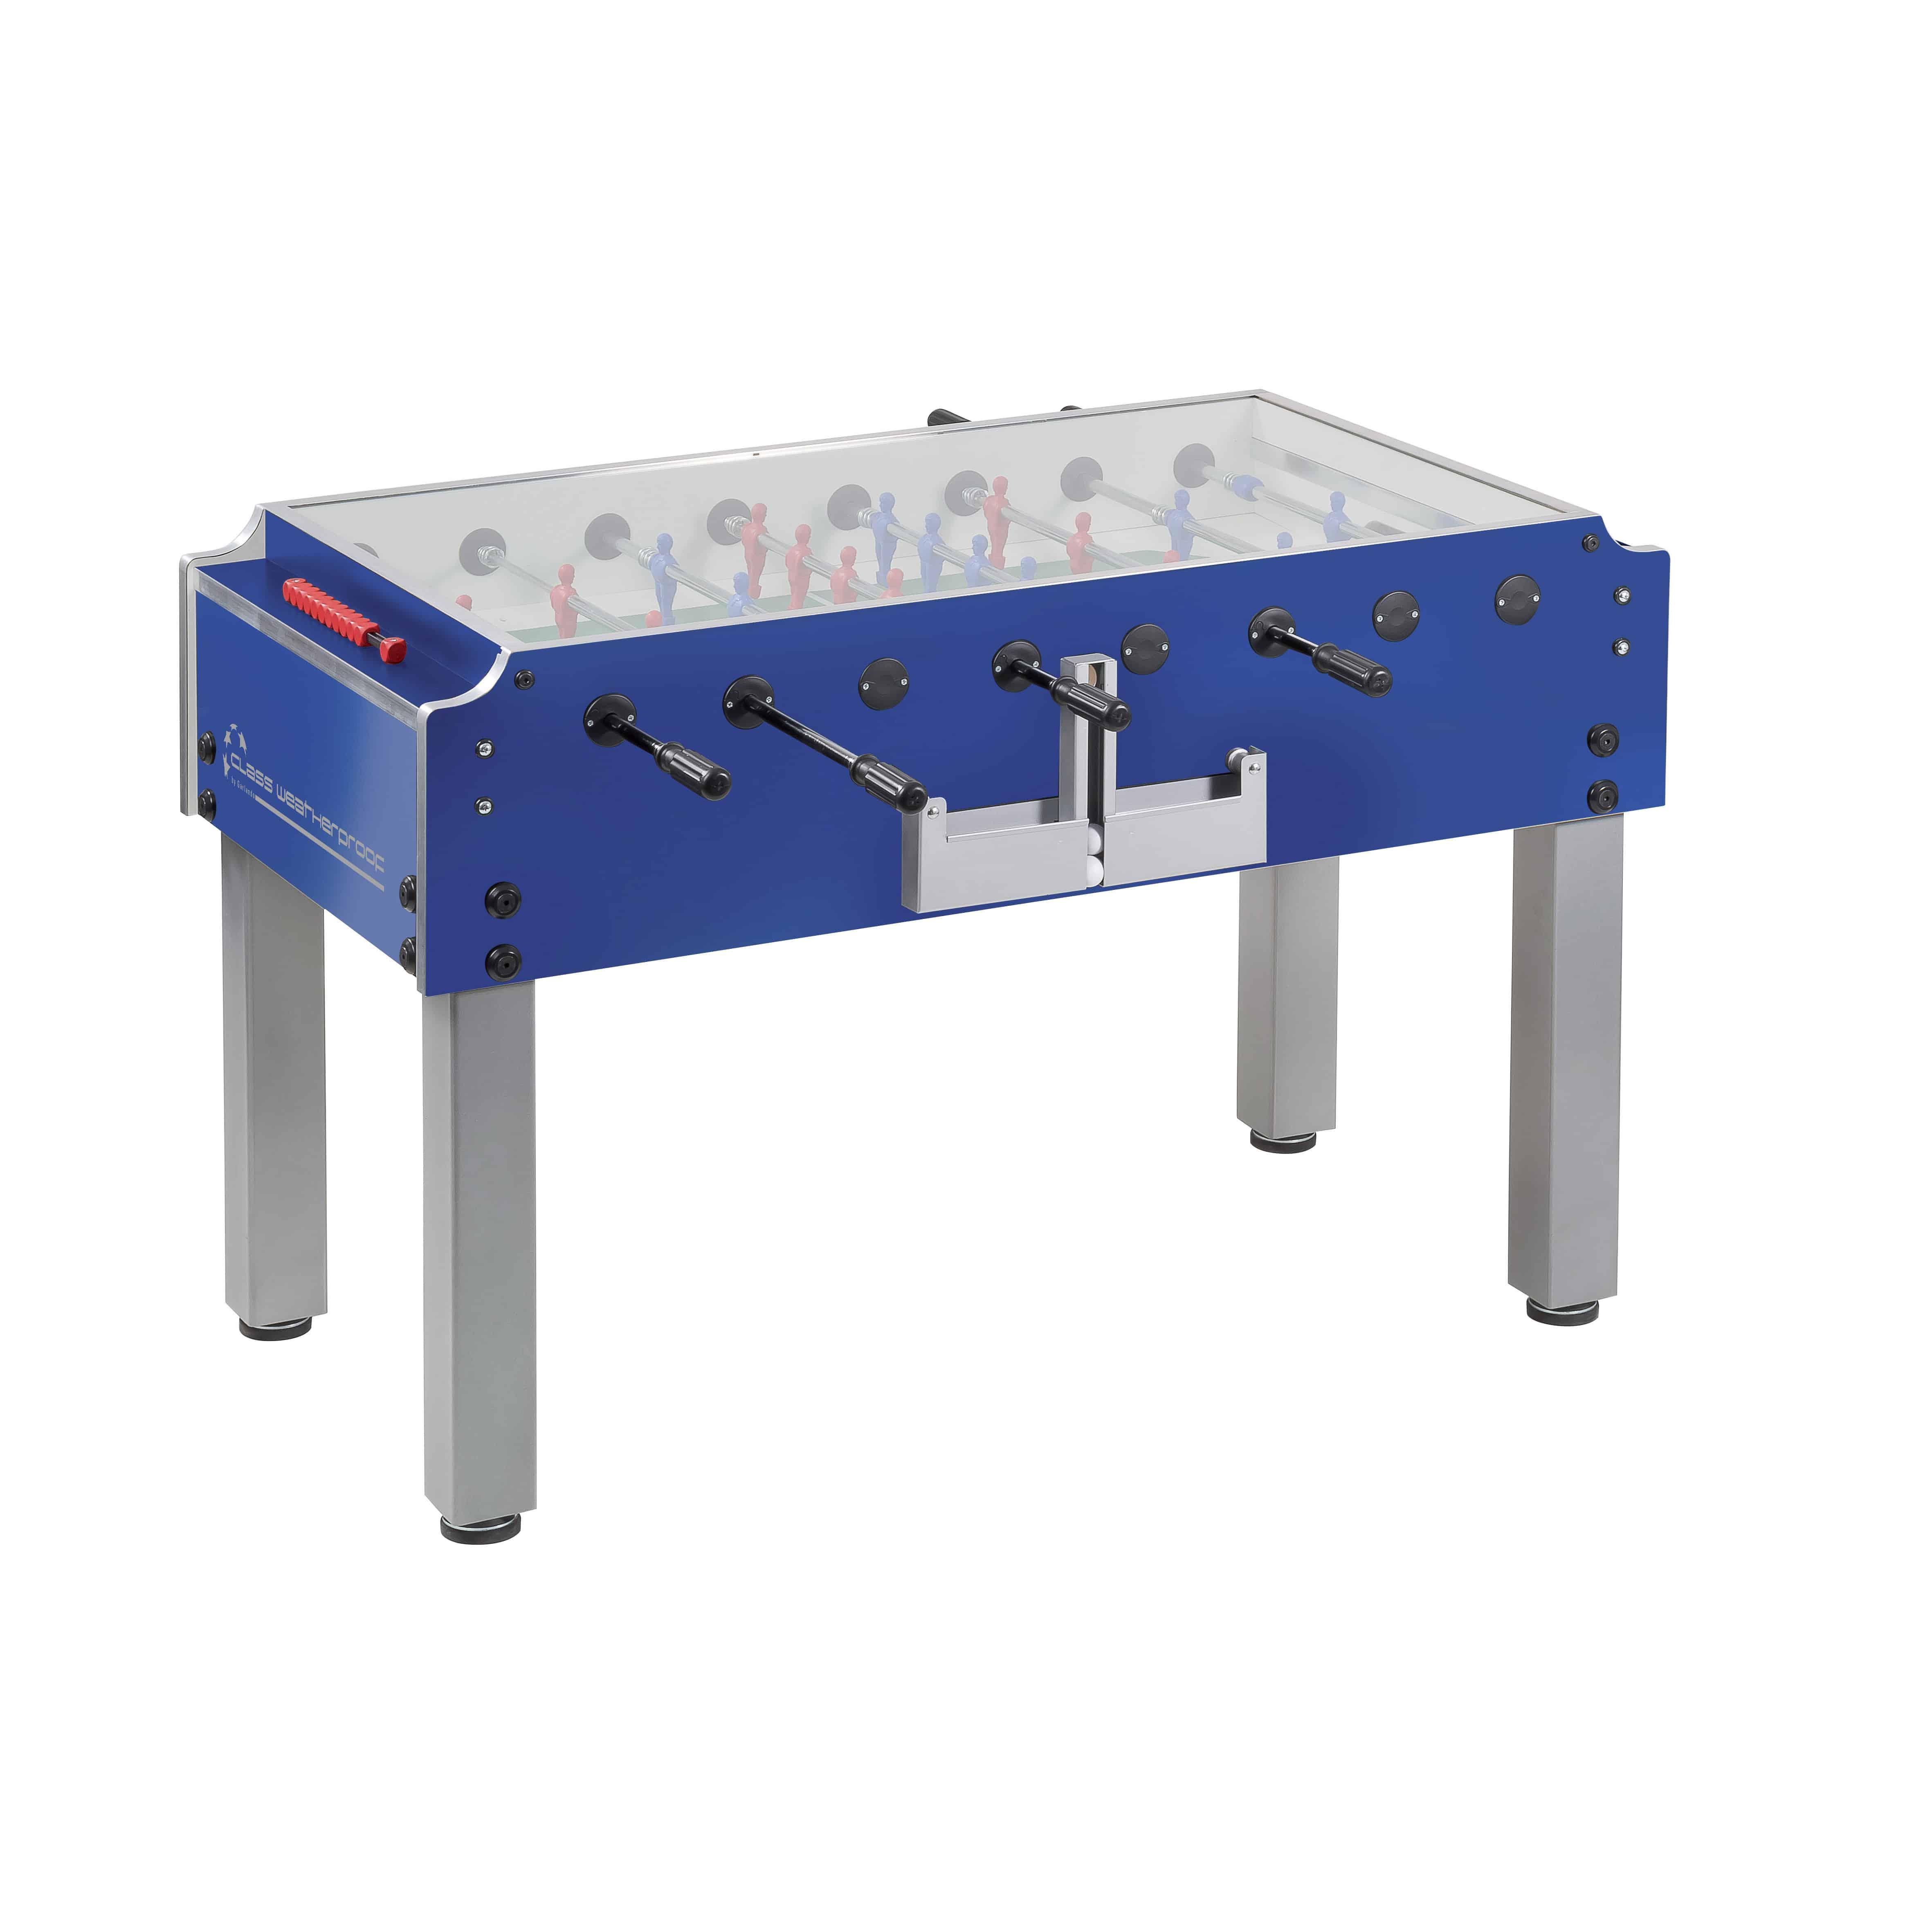 Garlando Class Weatherproof Table Football Table